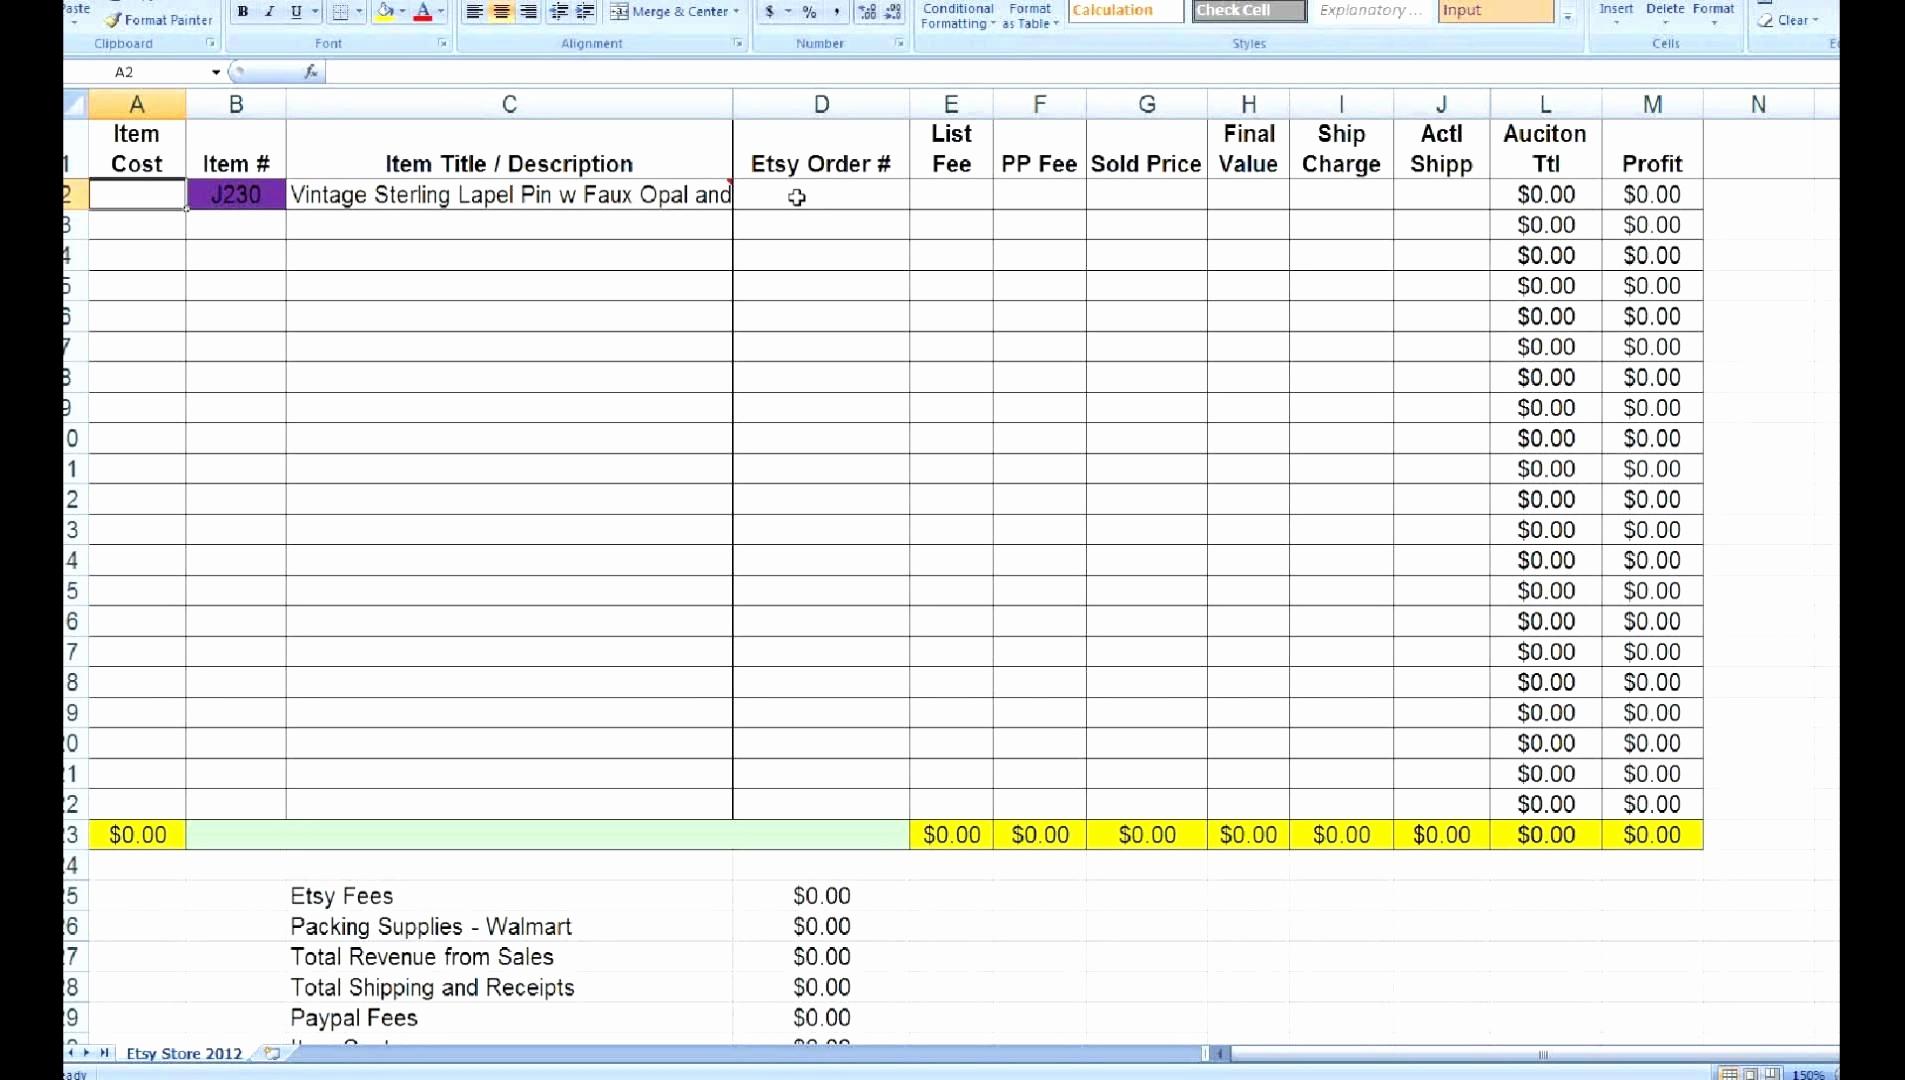 Biggest Loser Excel Spreadsheet Throughout 014 Issue Tracking Template Excel Biggest Loser Sheet Fresh Luxury